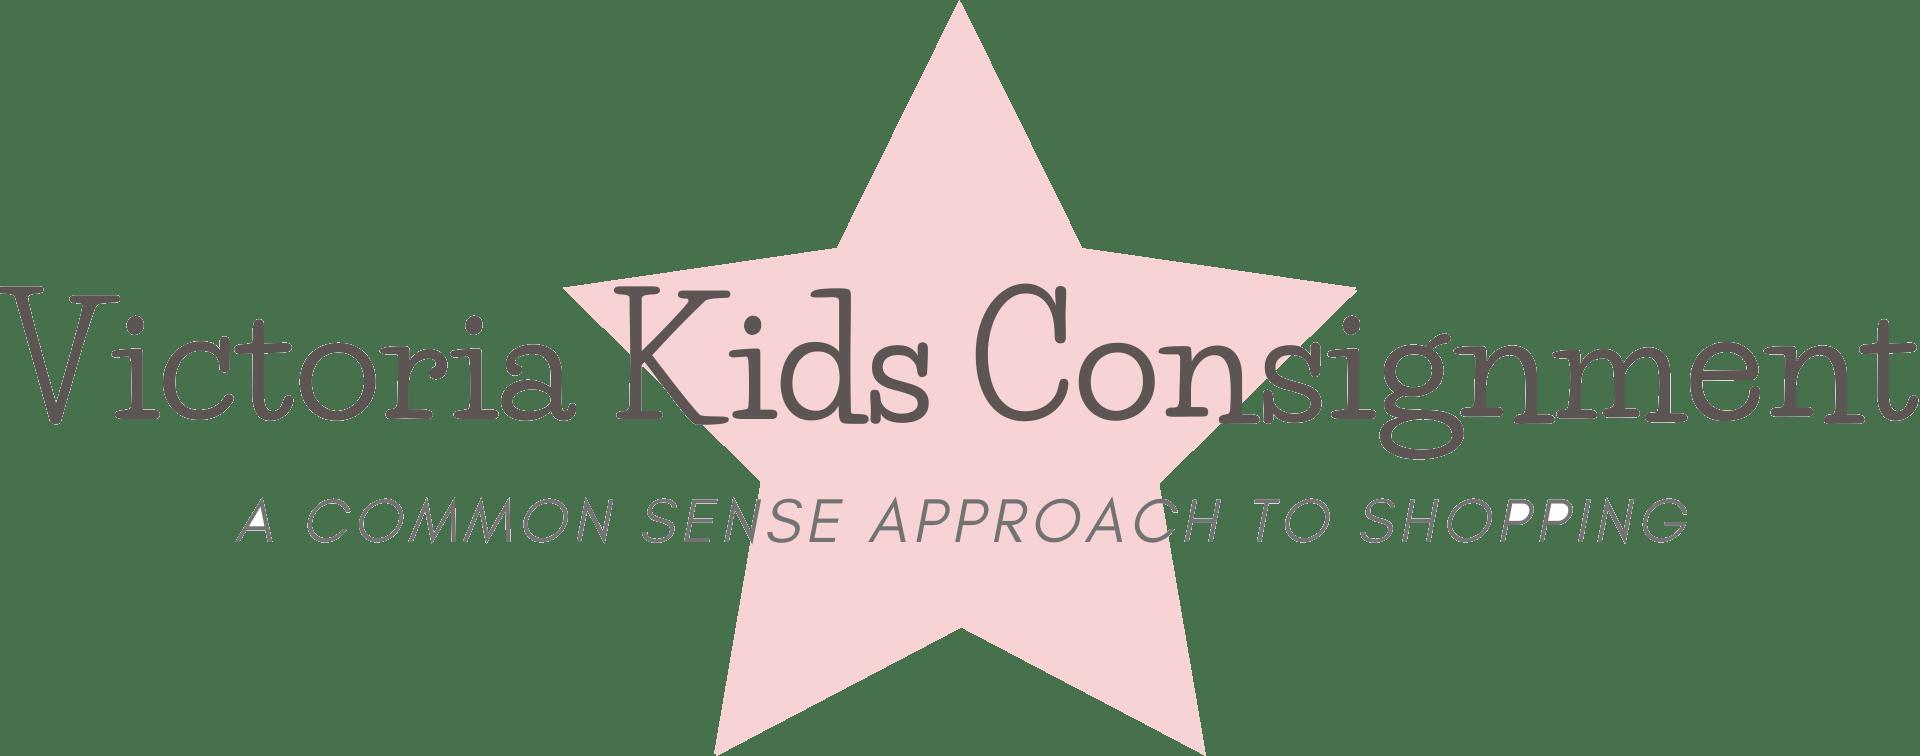 Victoria Kids Consignment